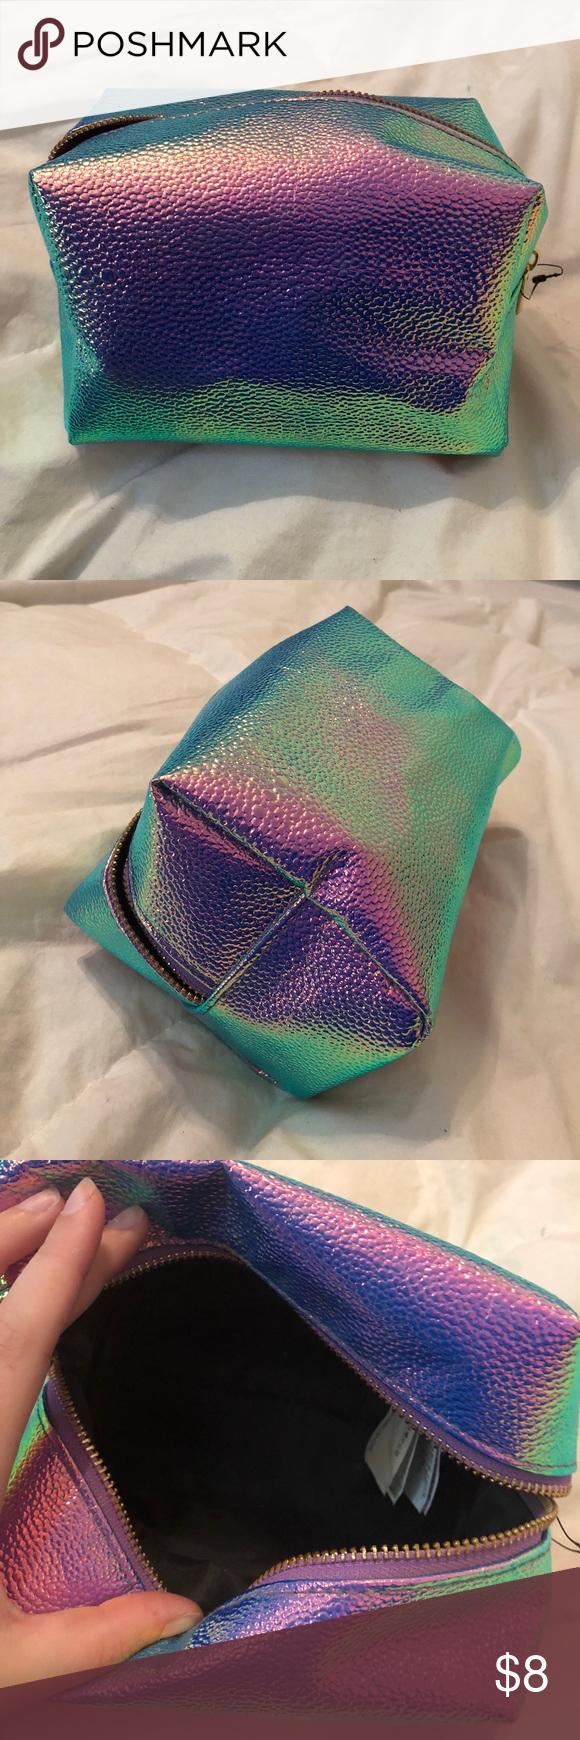 Large Multicolor Shiny Holographic Makeup Bag 💄